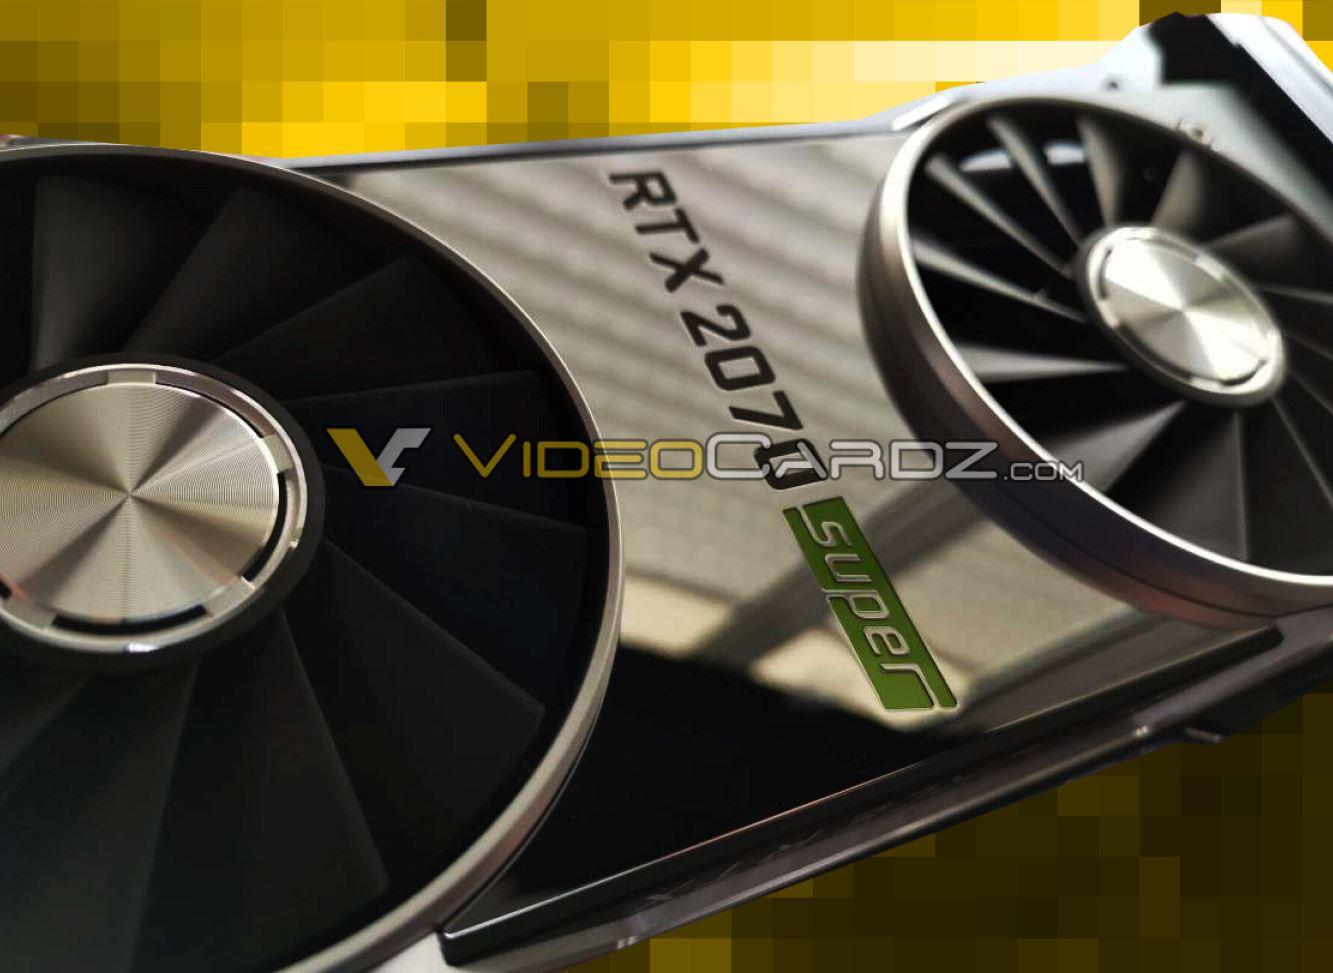 NVIDIA RTX Super specifications leak, RTX 2080 Super touted